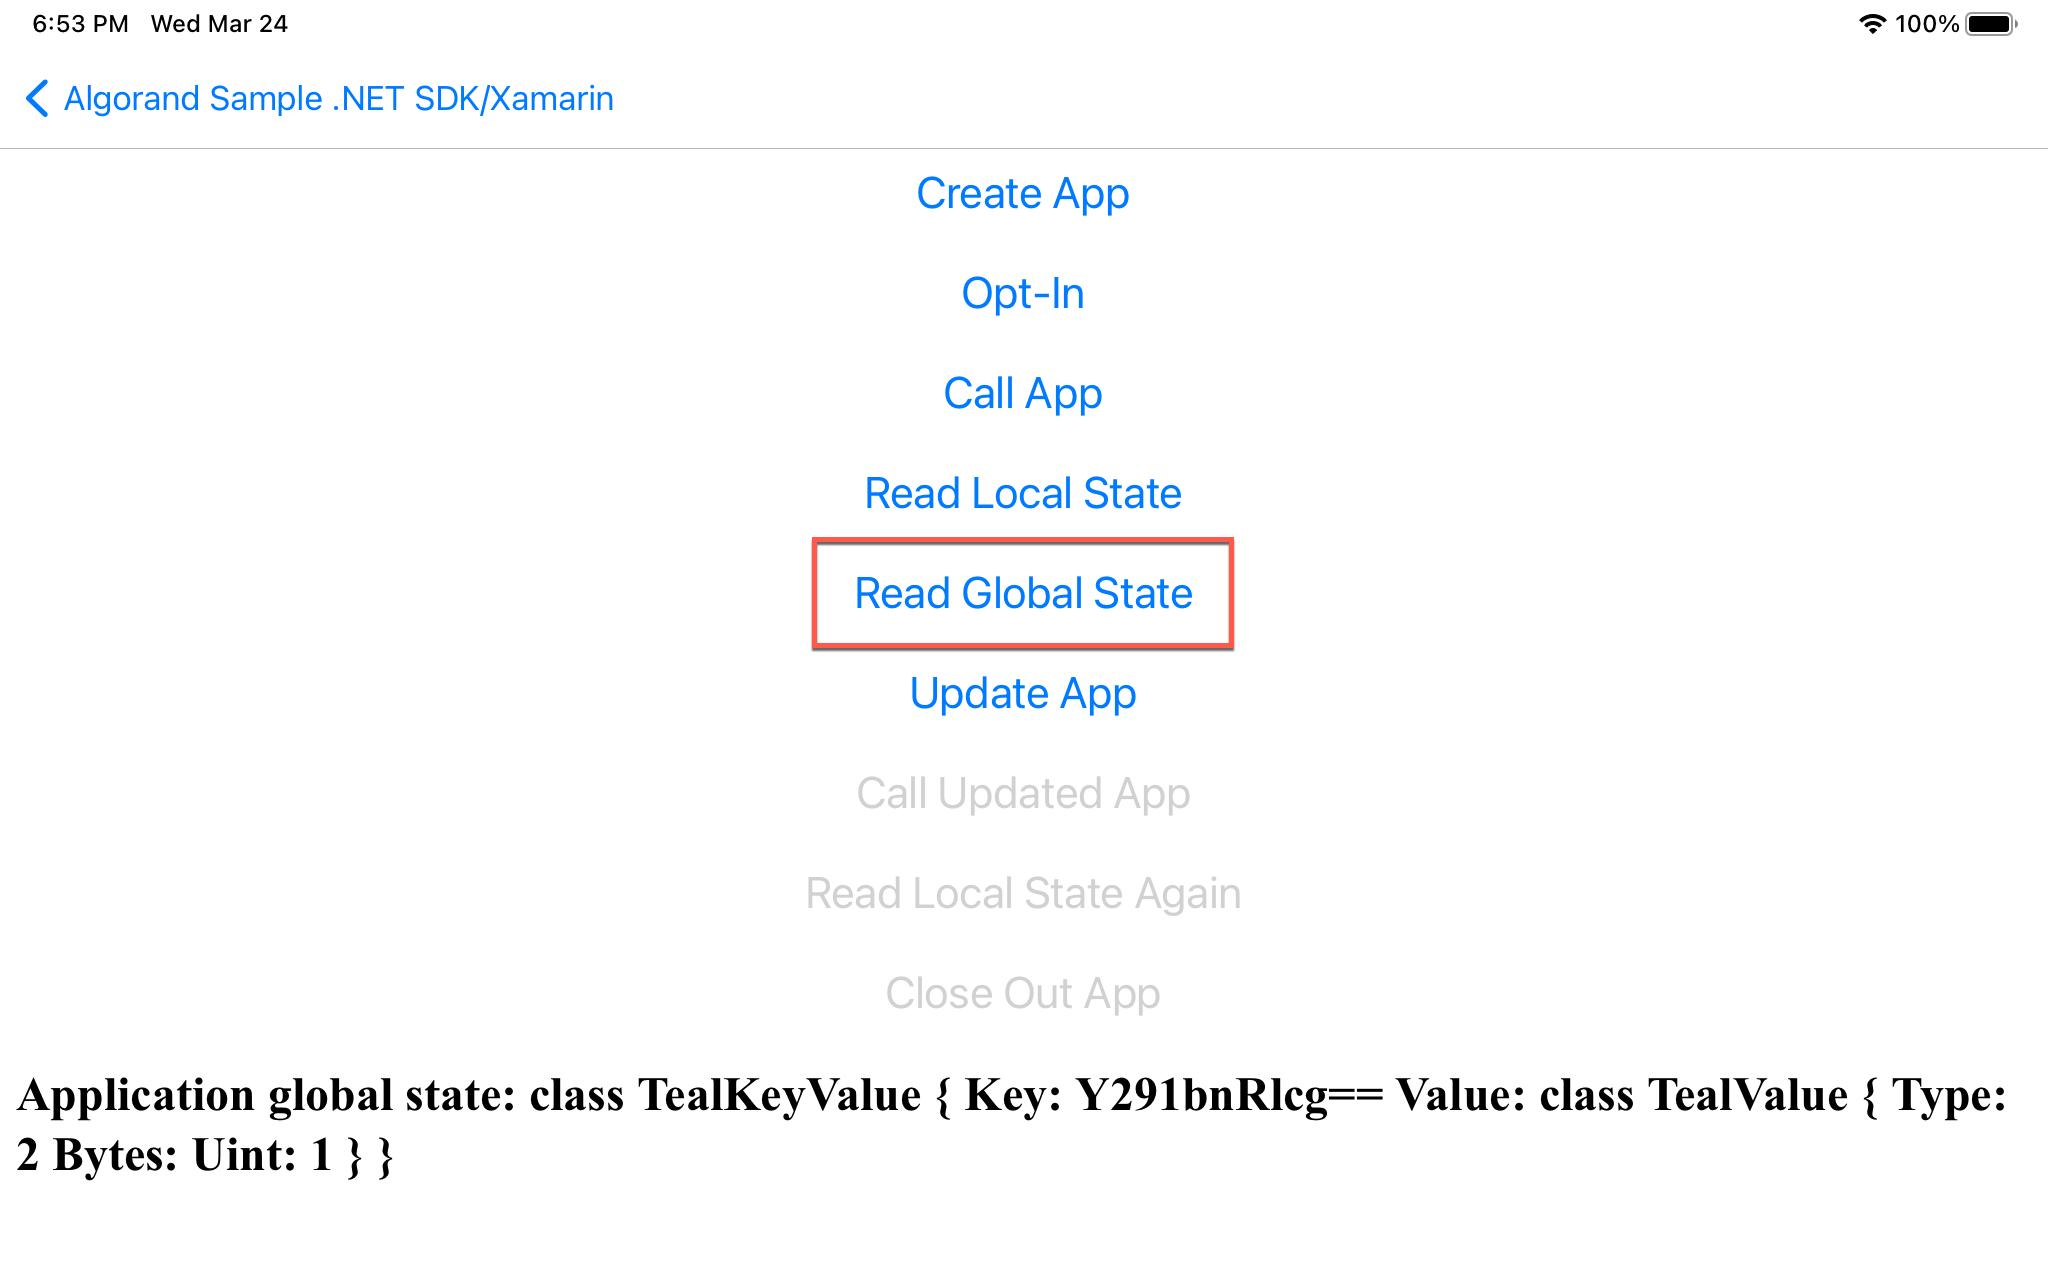 Read Global State